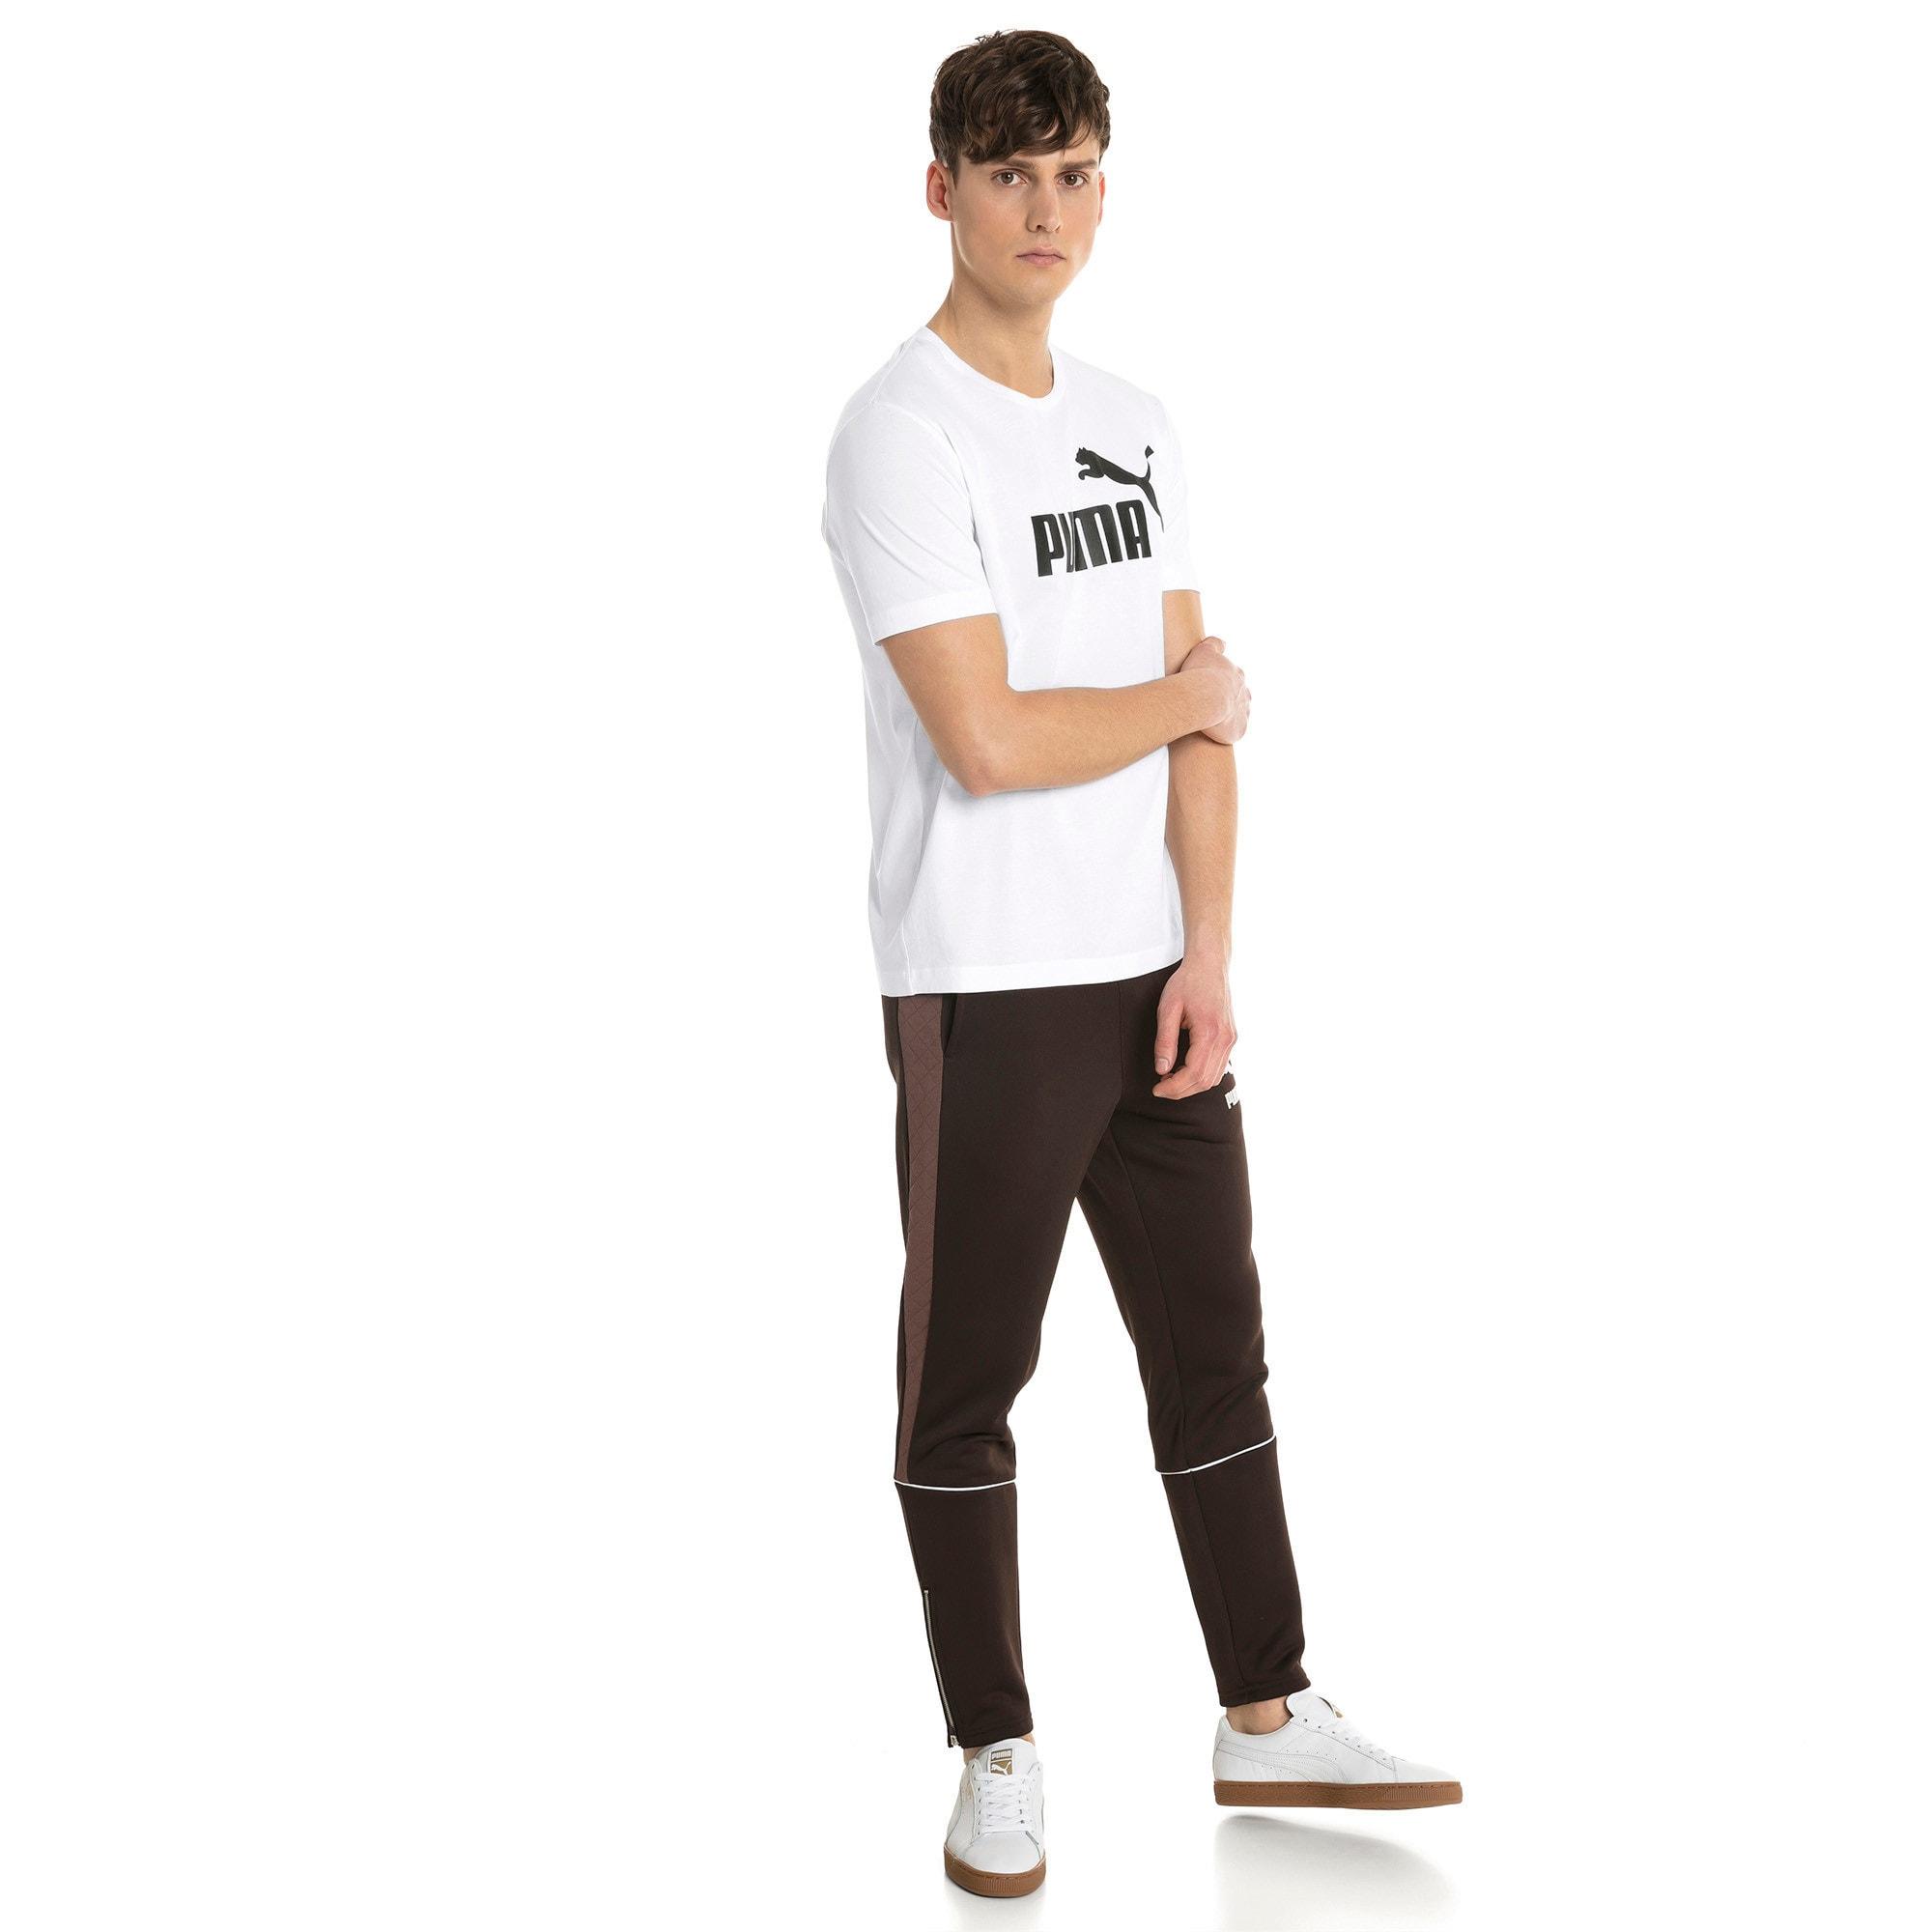 Thumbnail 3 of T-shirt a maniche corte Essentials uomo, Puma White, medium